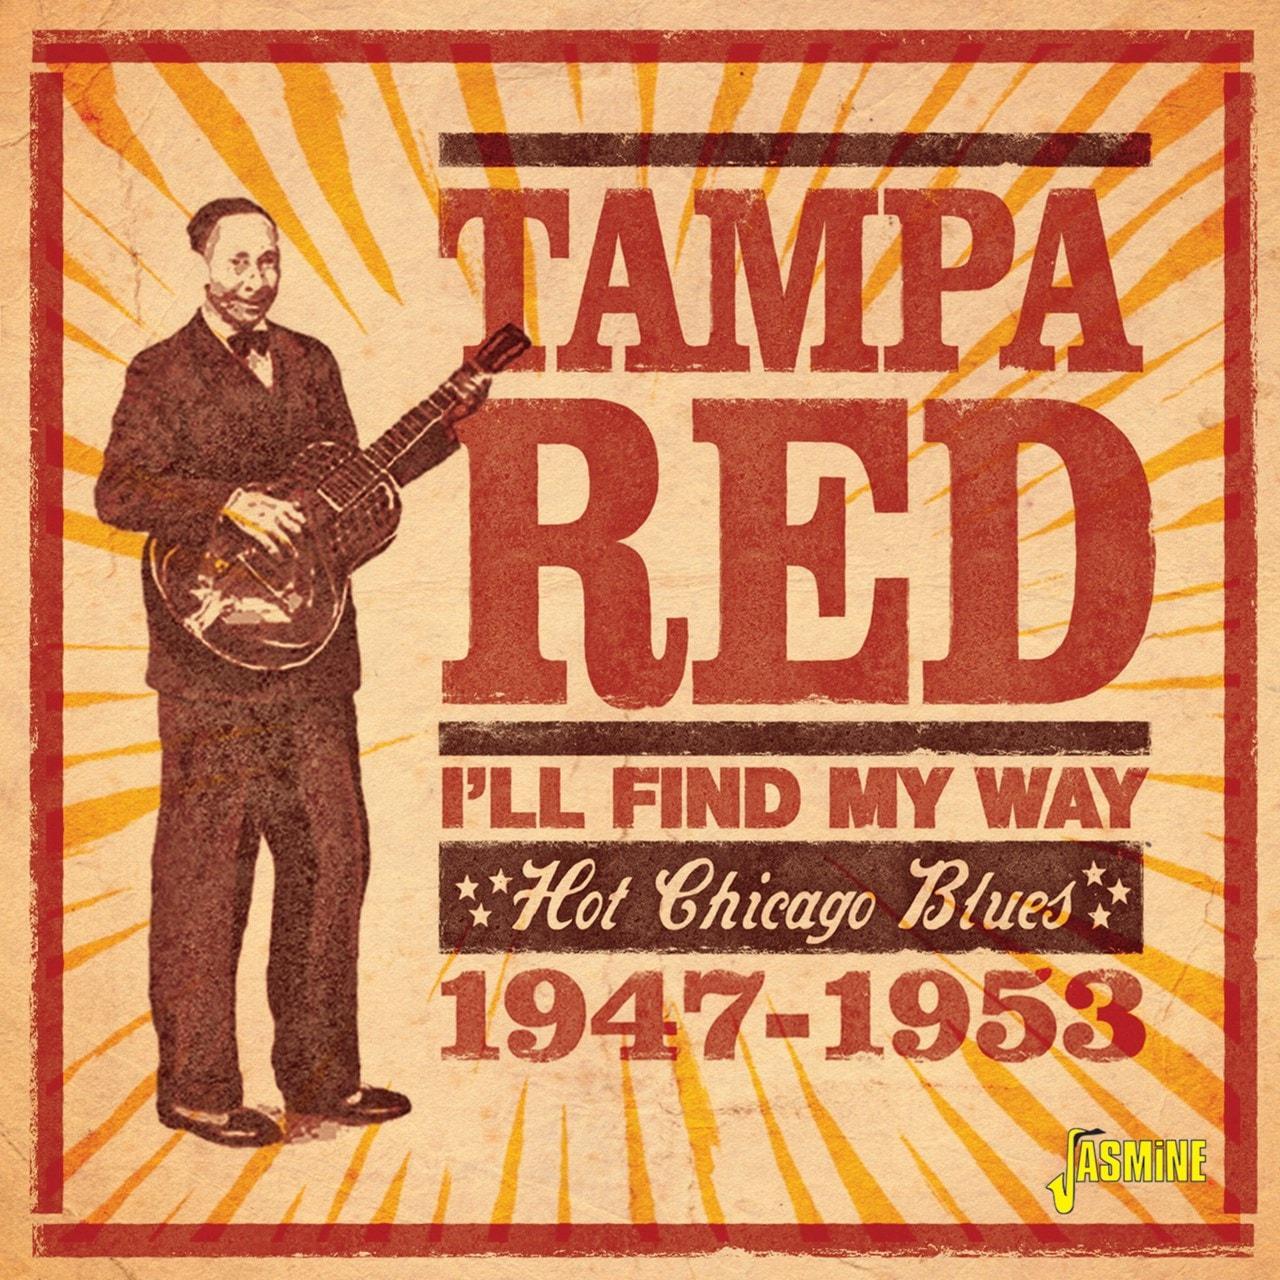 I'll Find My Way: Hot Chicago Blues 1947-1953 - 1